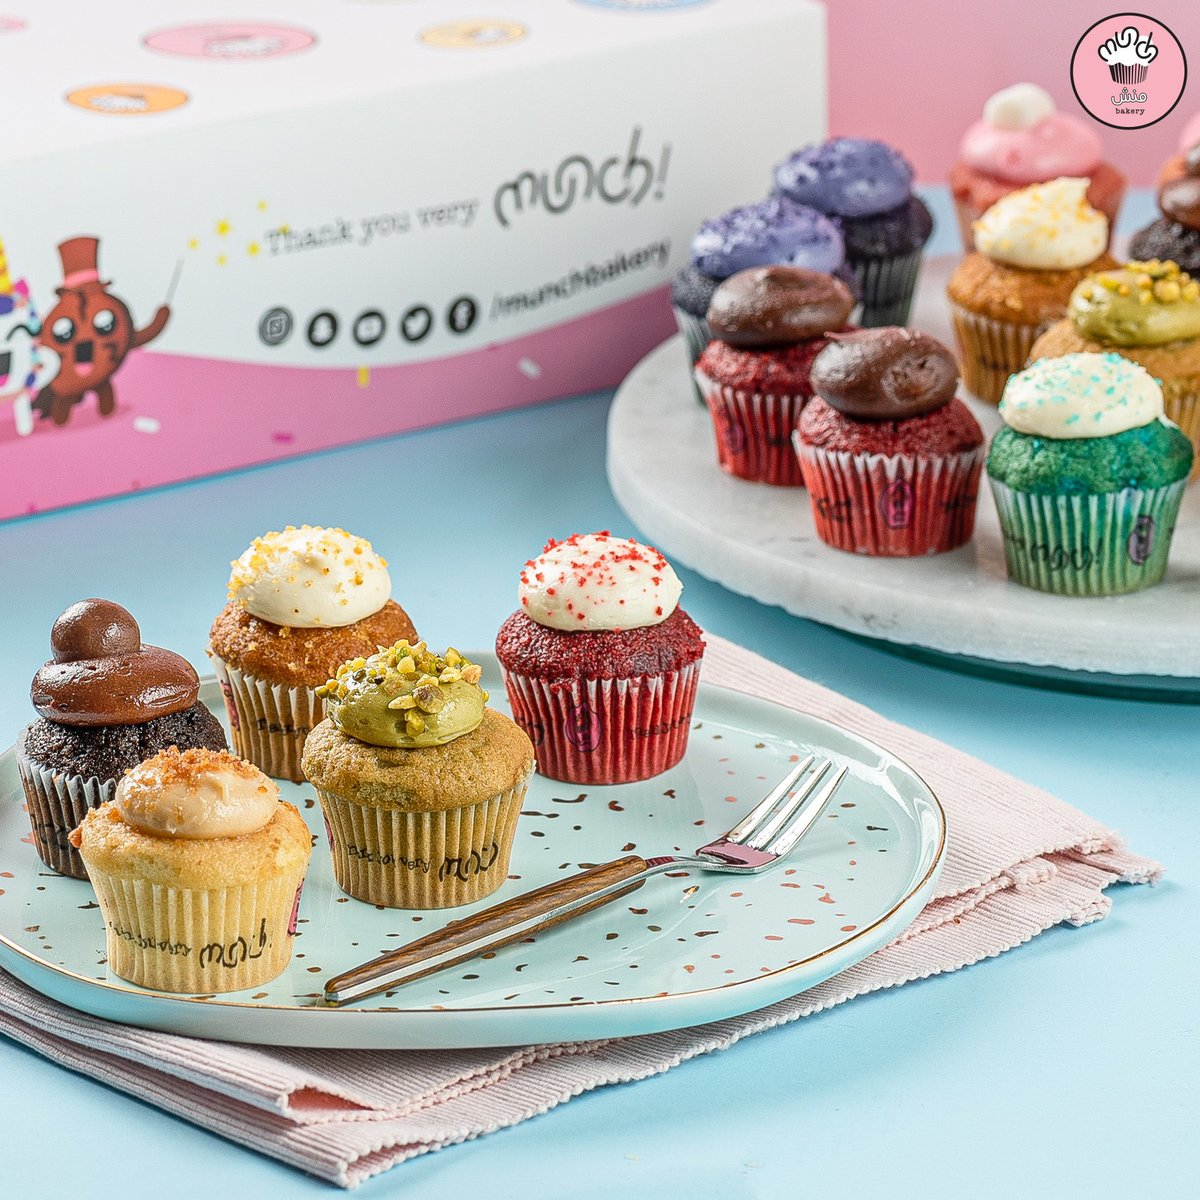 Munch Bakery On Twitter كانت بدايات منش في صنع السعادة الكب كيك خبرونا ايش نكهة الكب كيك المفضلة عندكم Mini Cupcakes Were The First Product At Munch Bakery What S